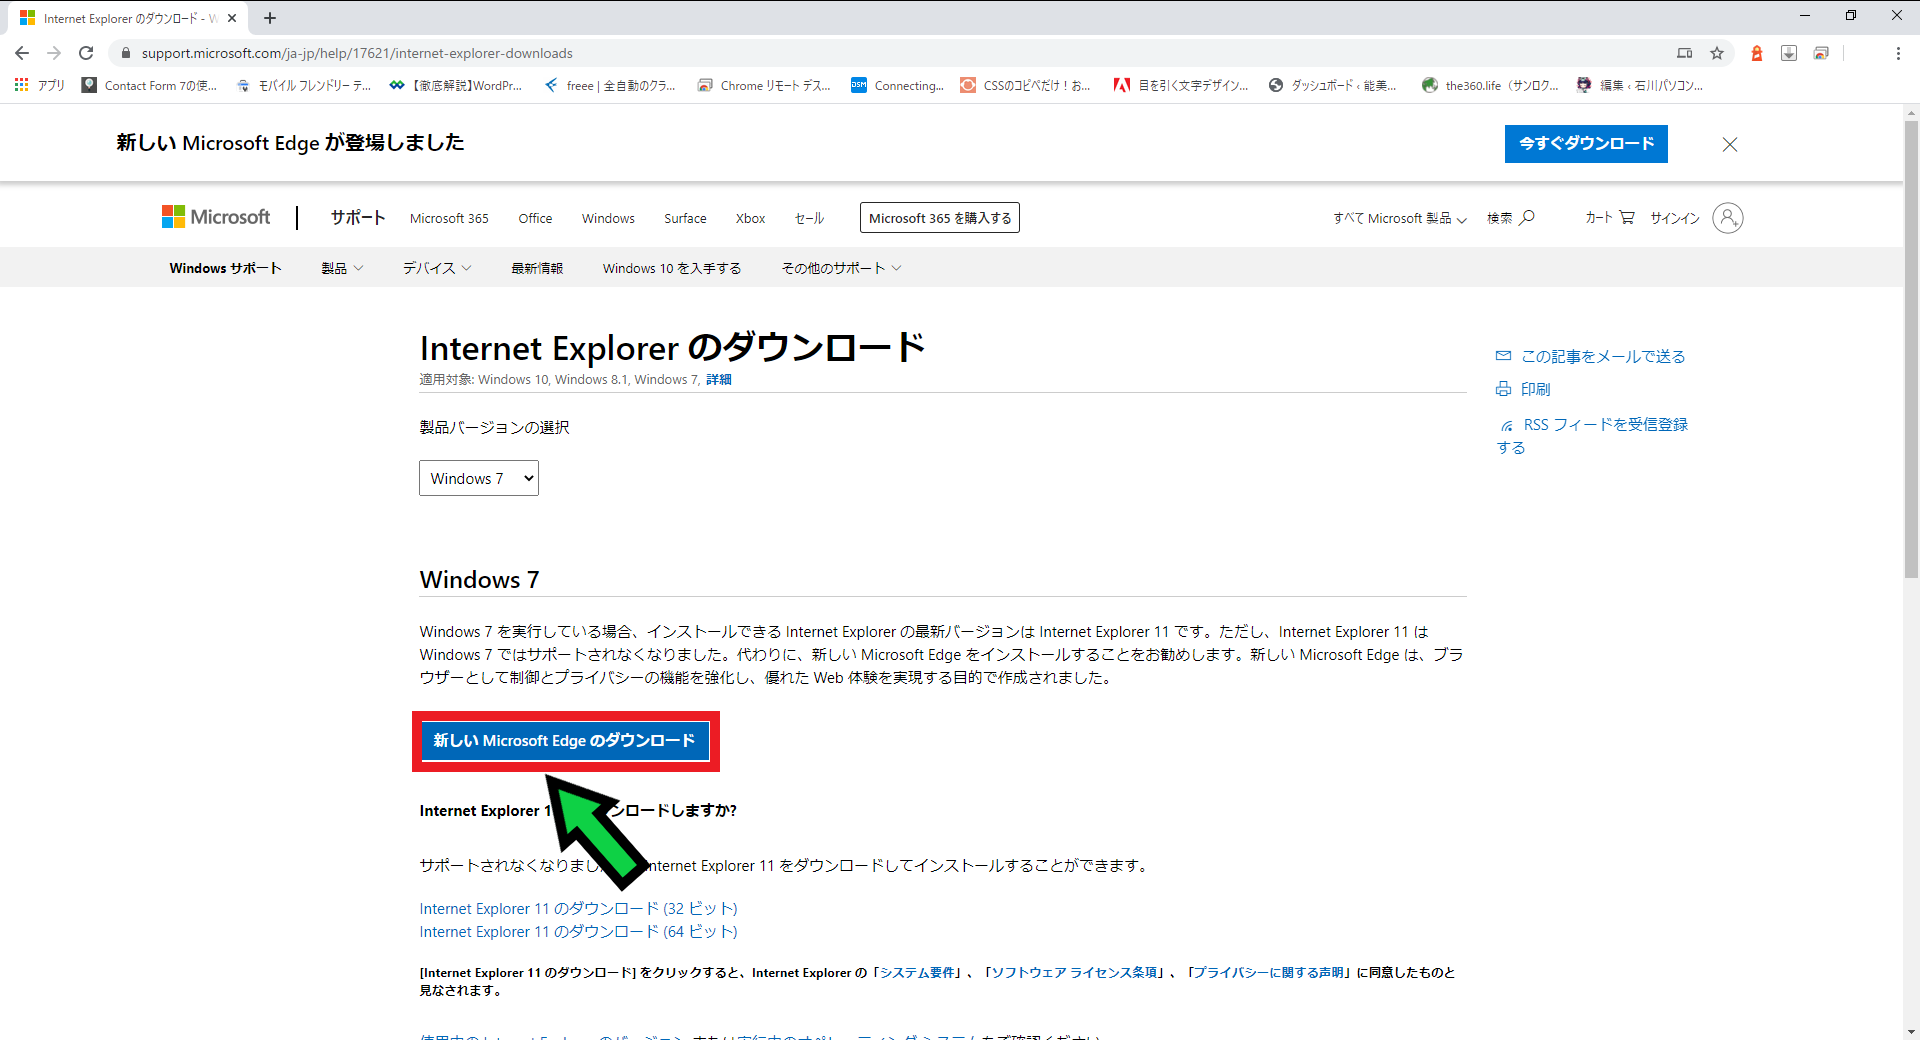 windows7でInternet Explorer(IE)が開かないときの対応方法